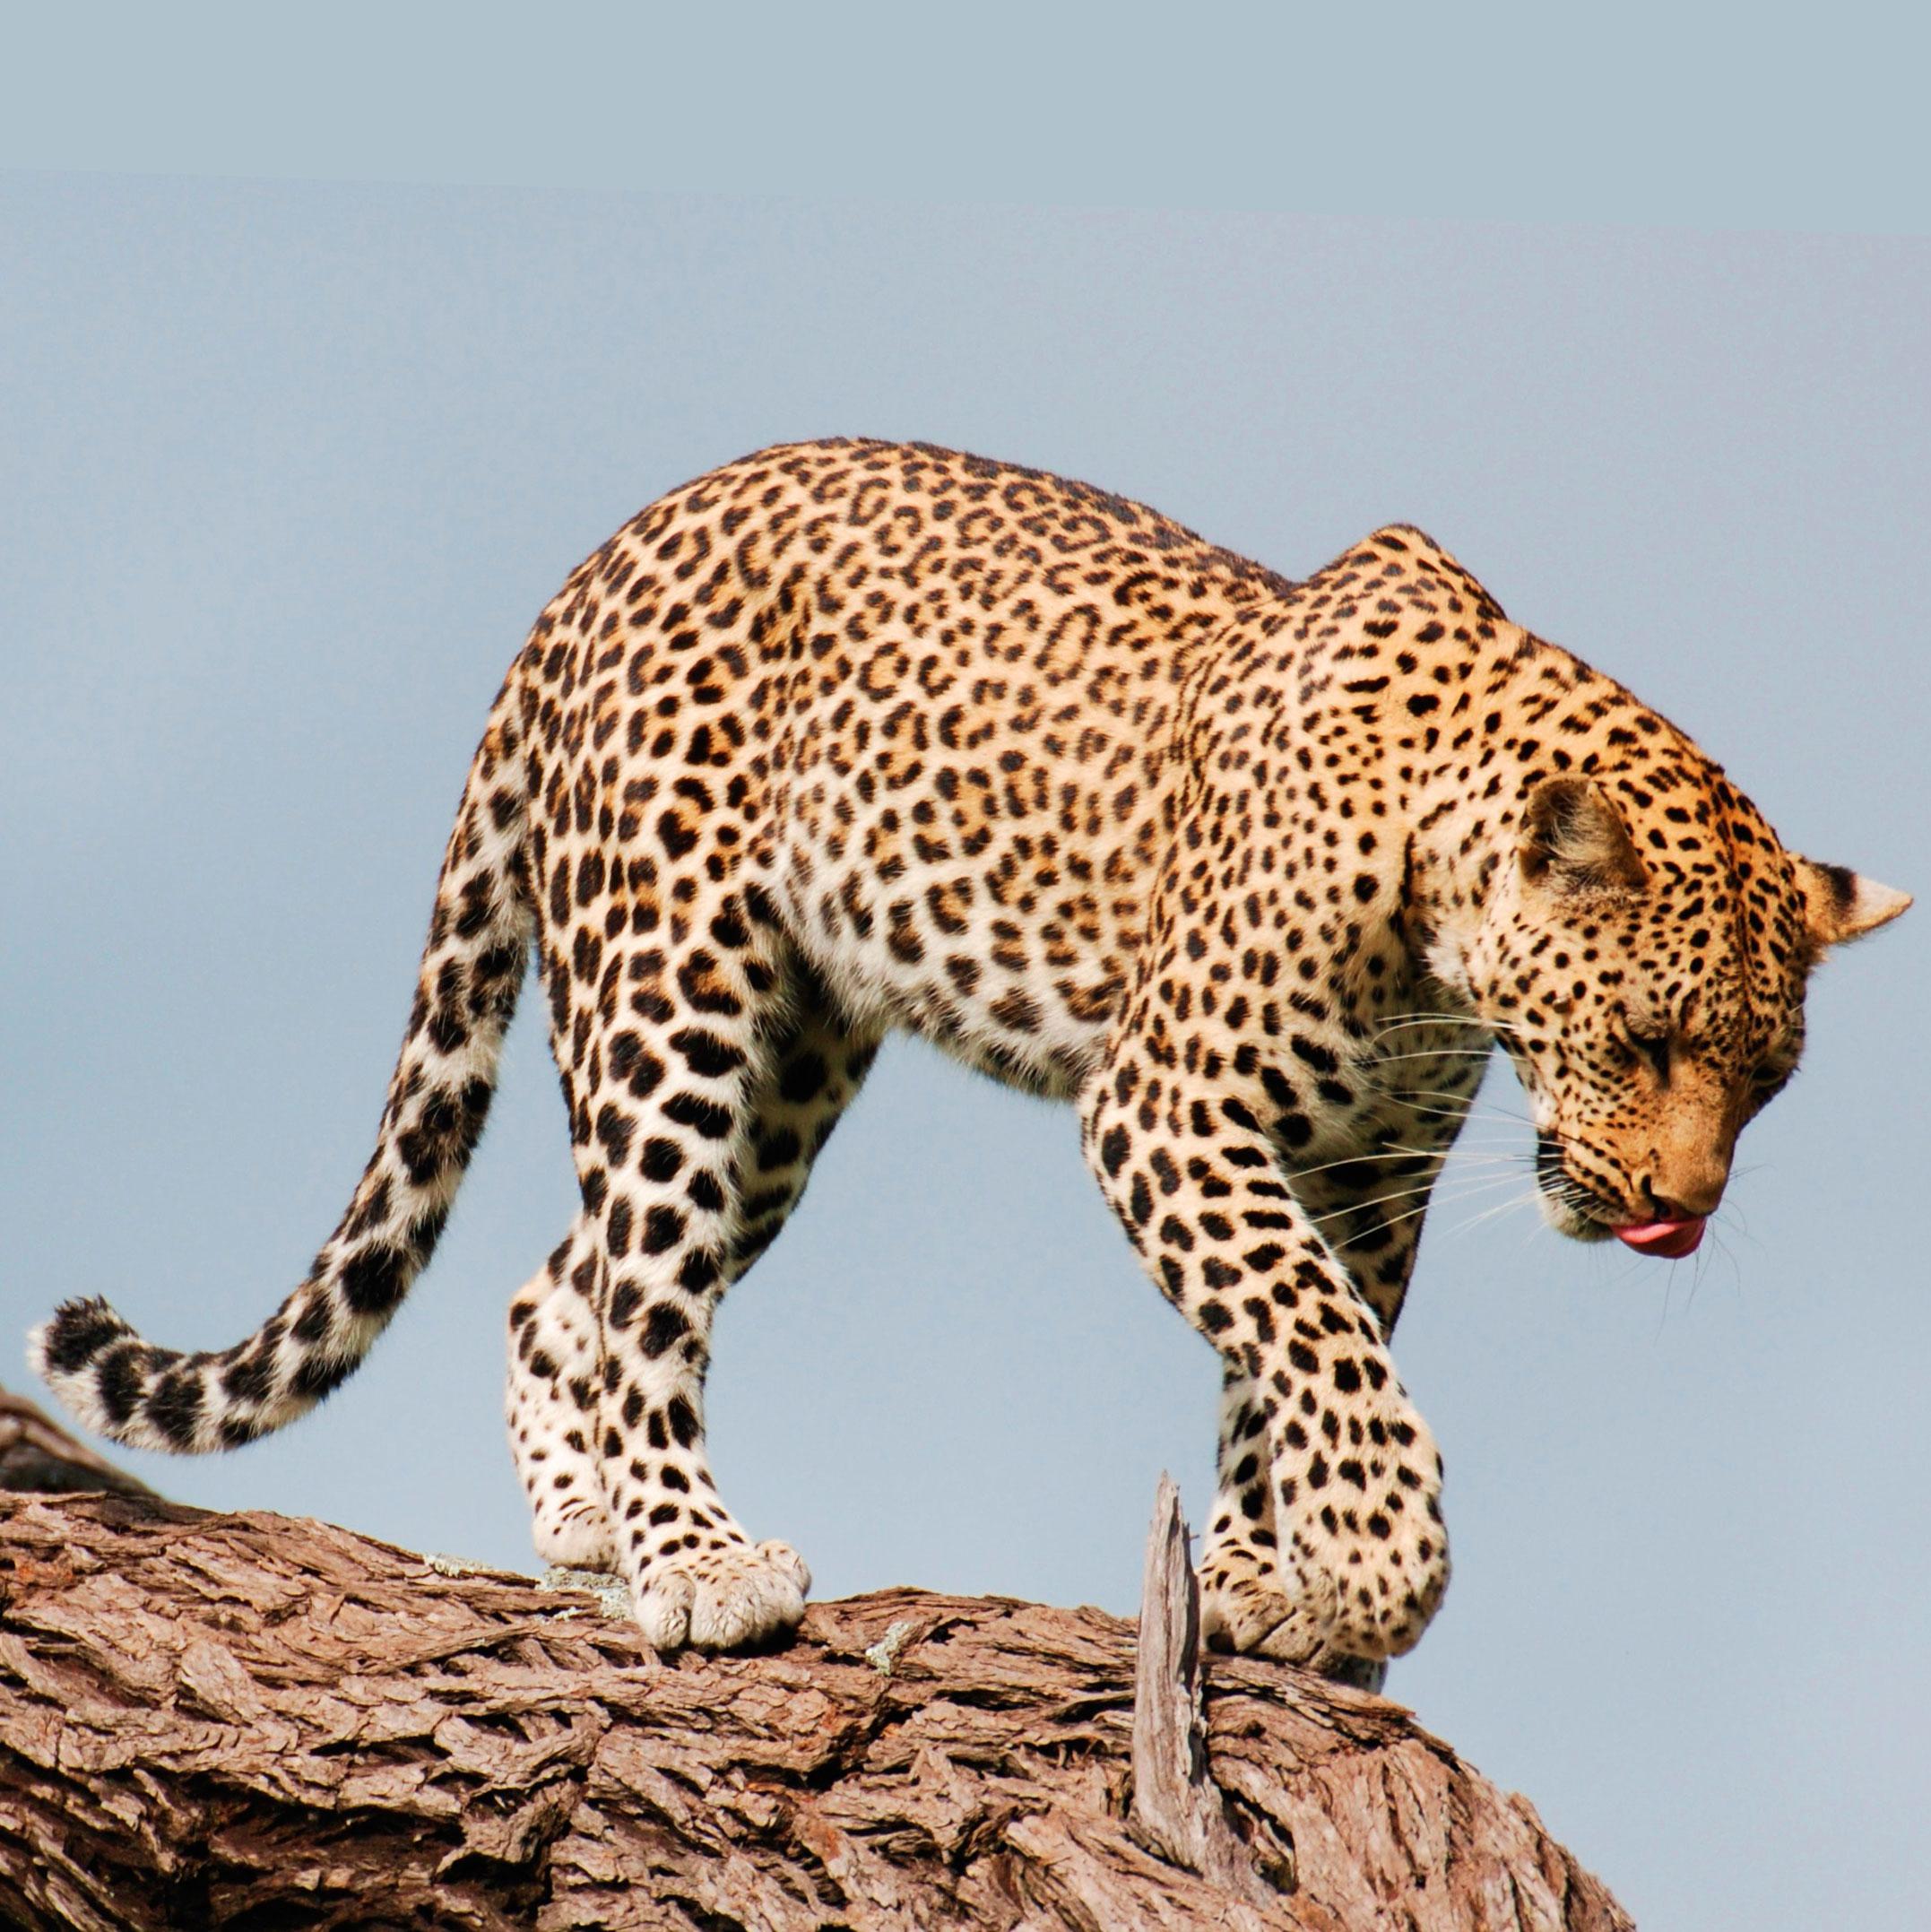 Леопард Доклад о животном Окружающий мир 2 класс